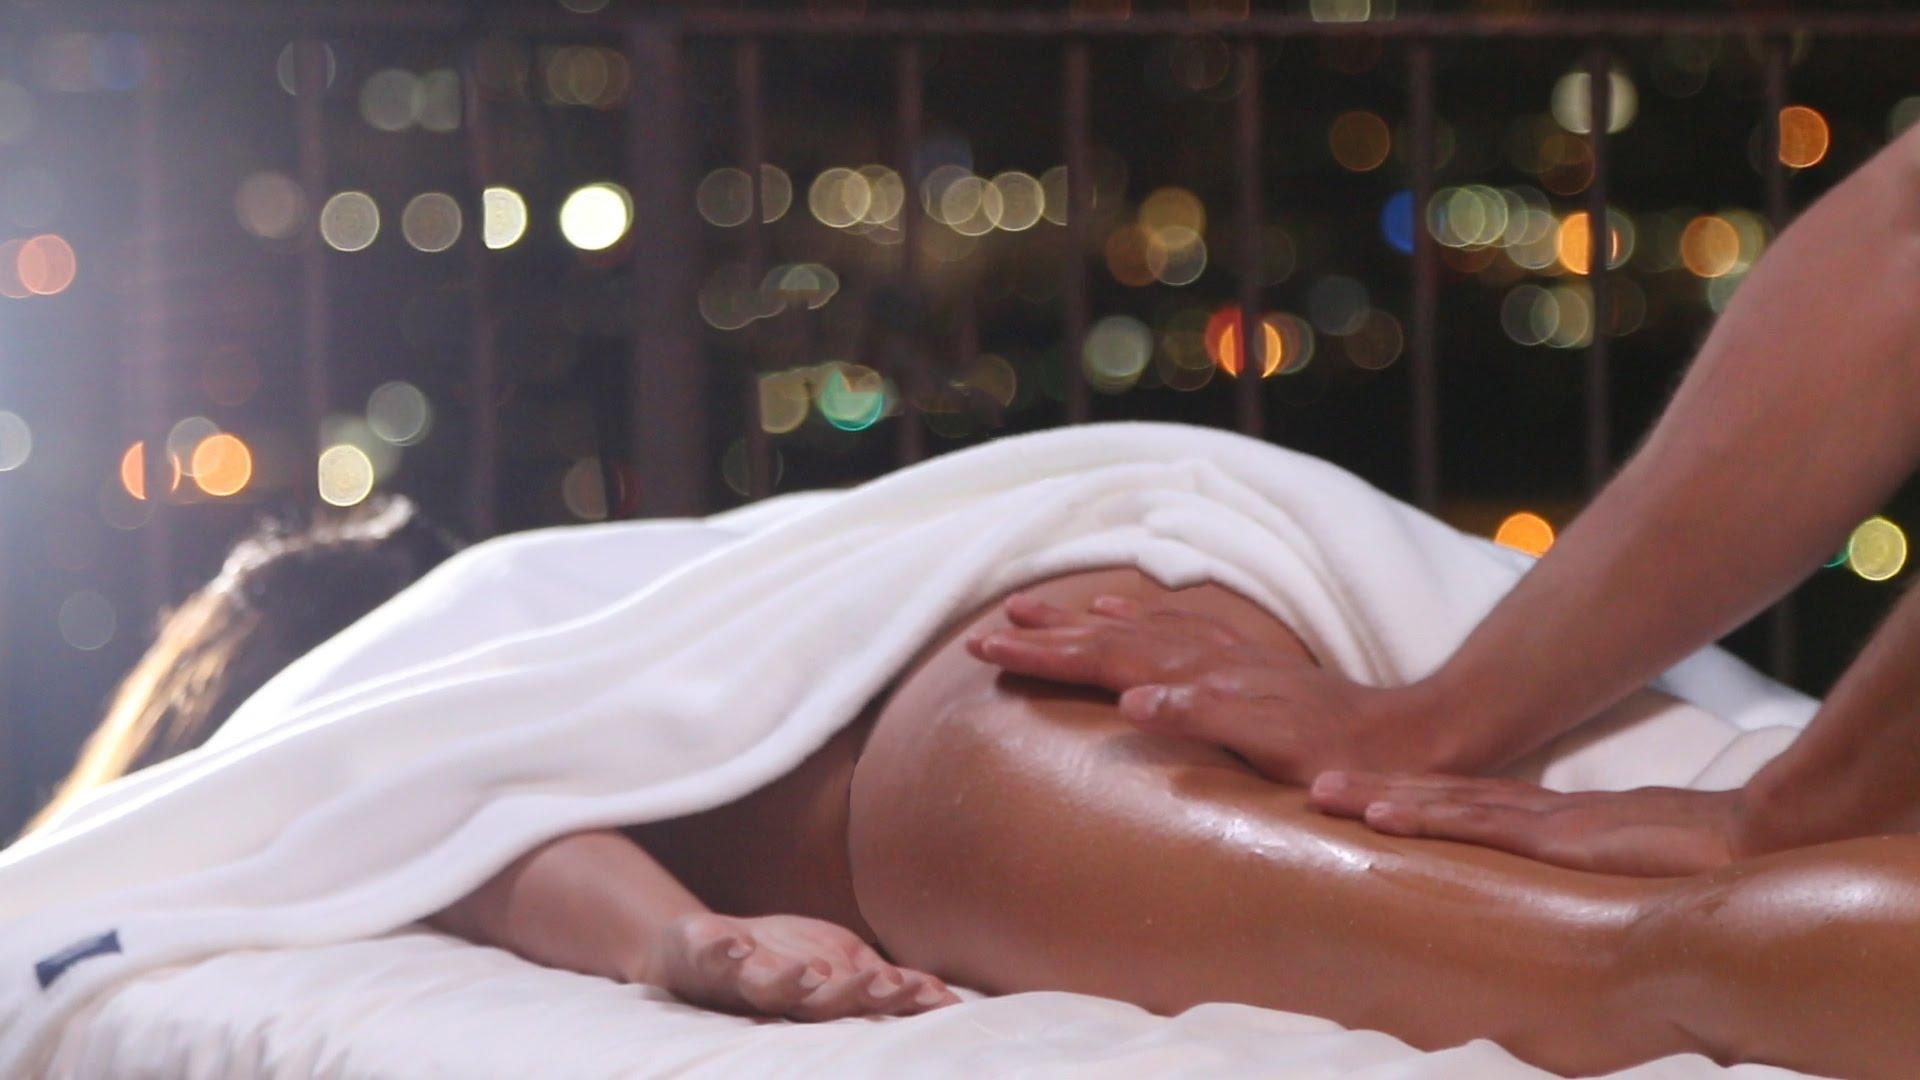 Erotic Full Body Massage Erotic Massage